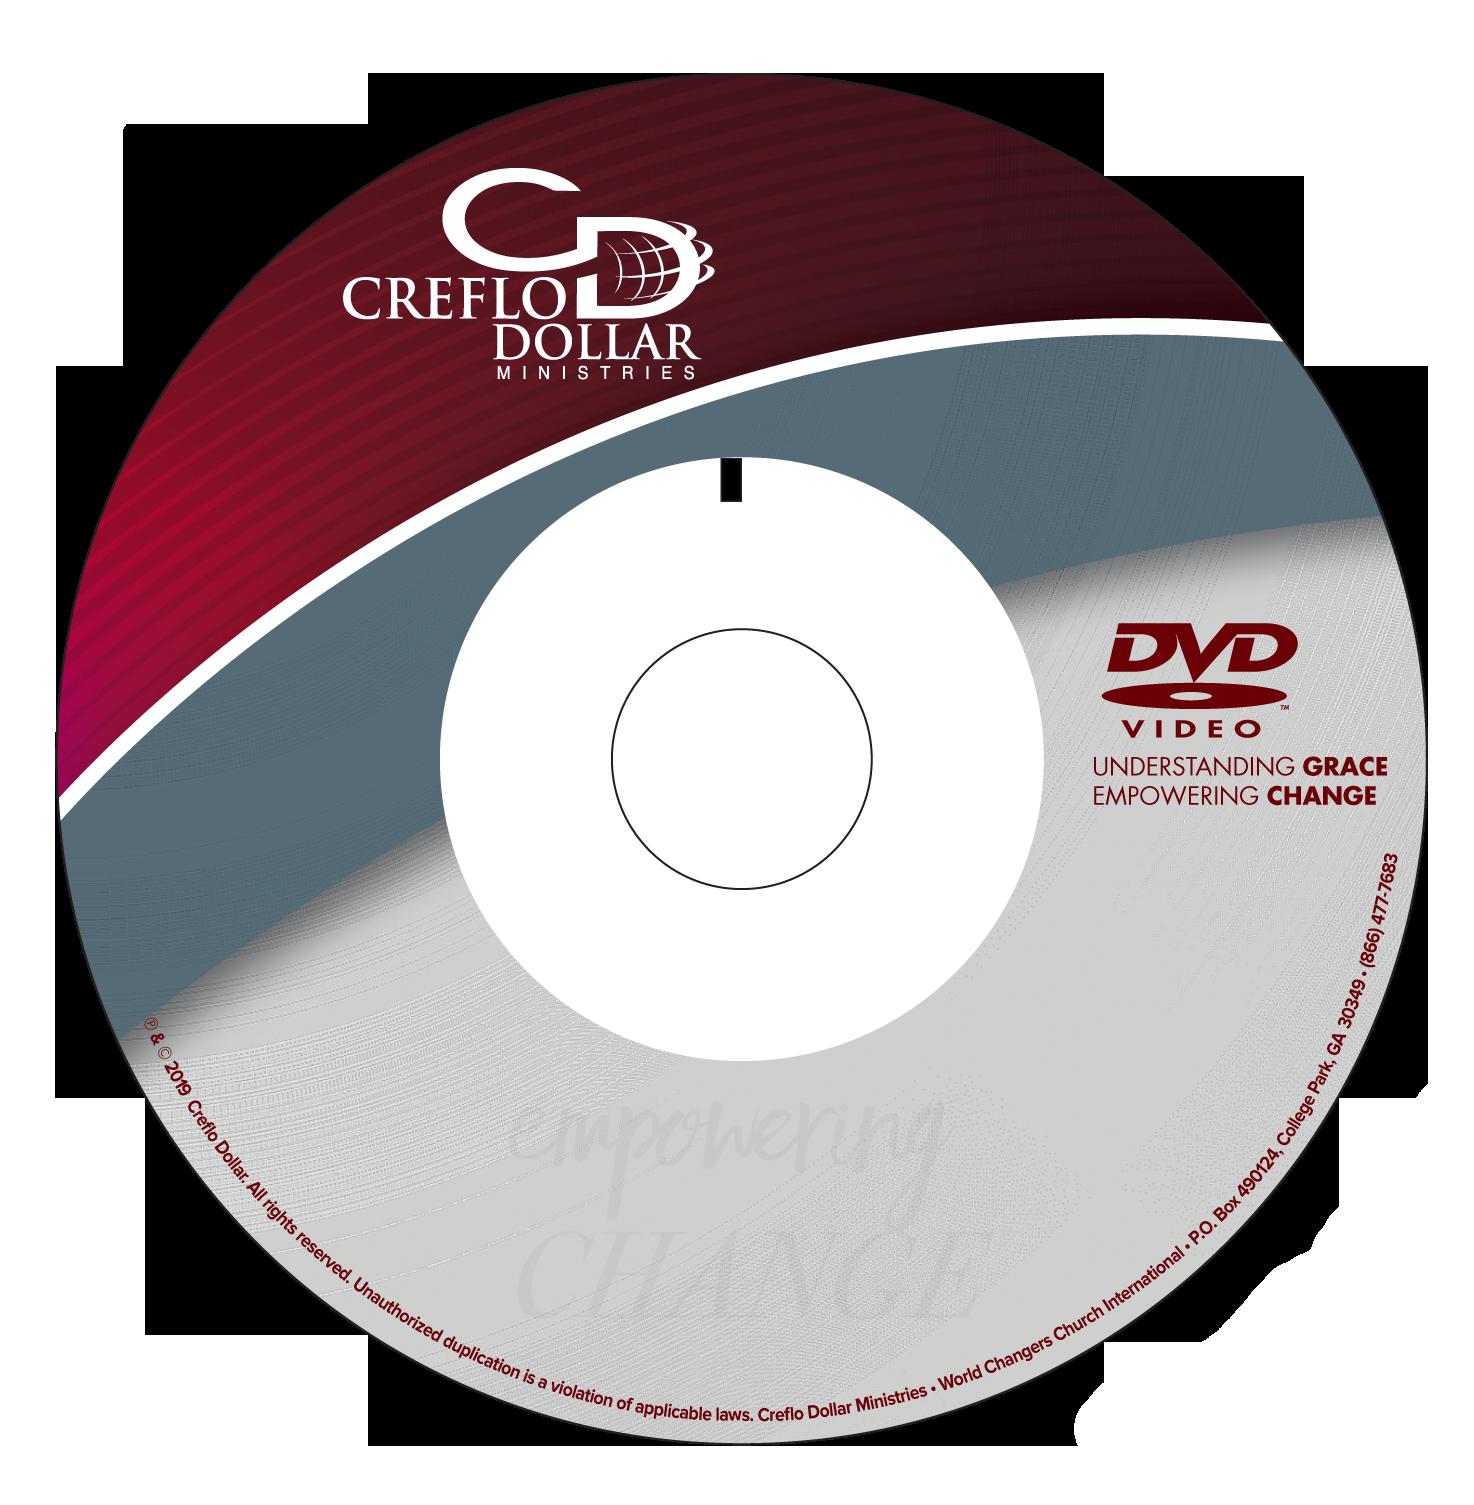 061619 Sunday Service DVD 10am